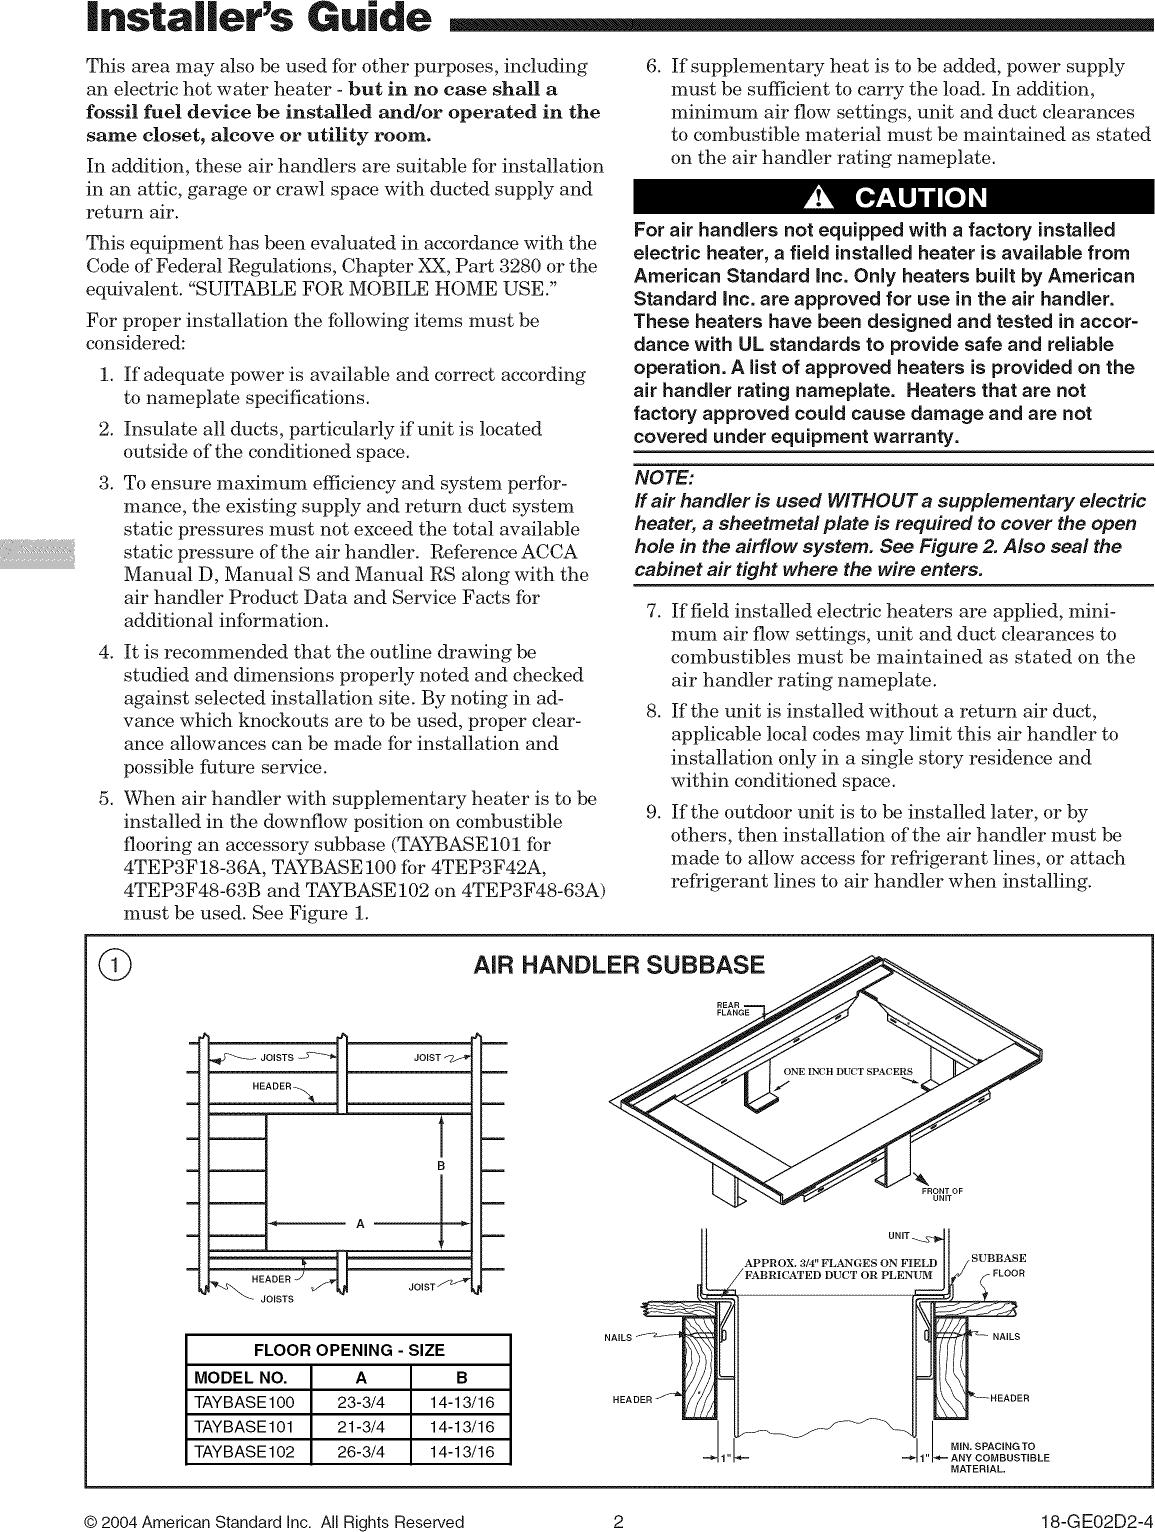 American standard air handler manual array trane air handler indoor blower u0026evap manual l0905036 rh usermanual wiki fandeluxe Image collections